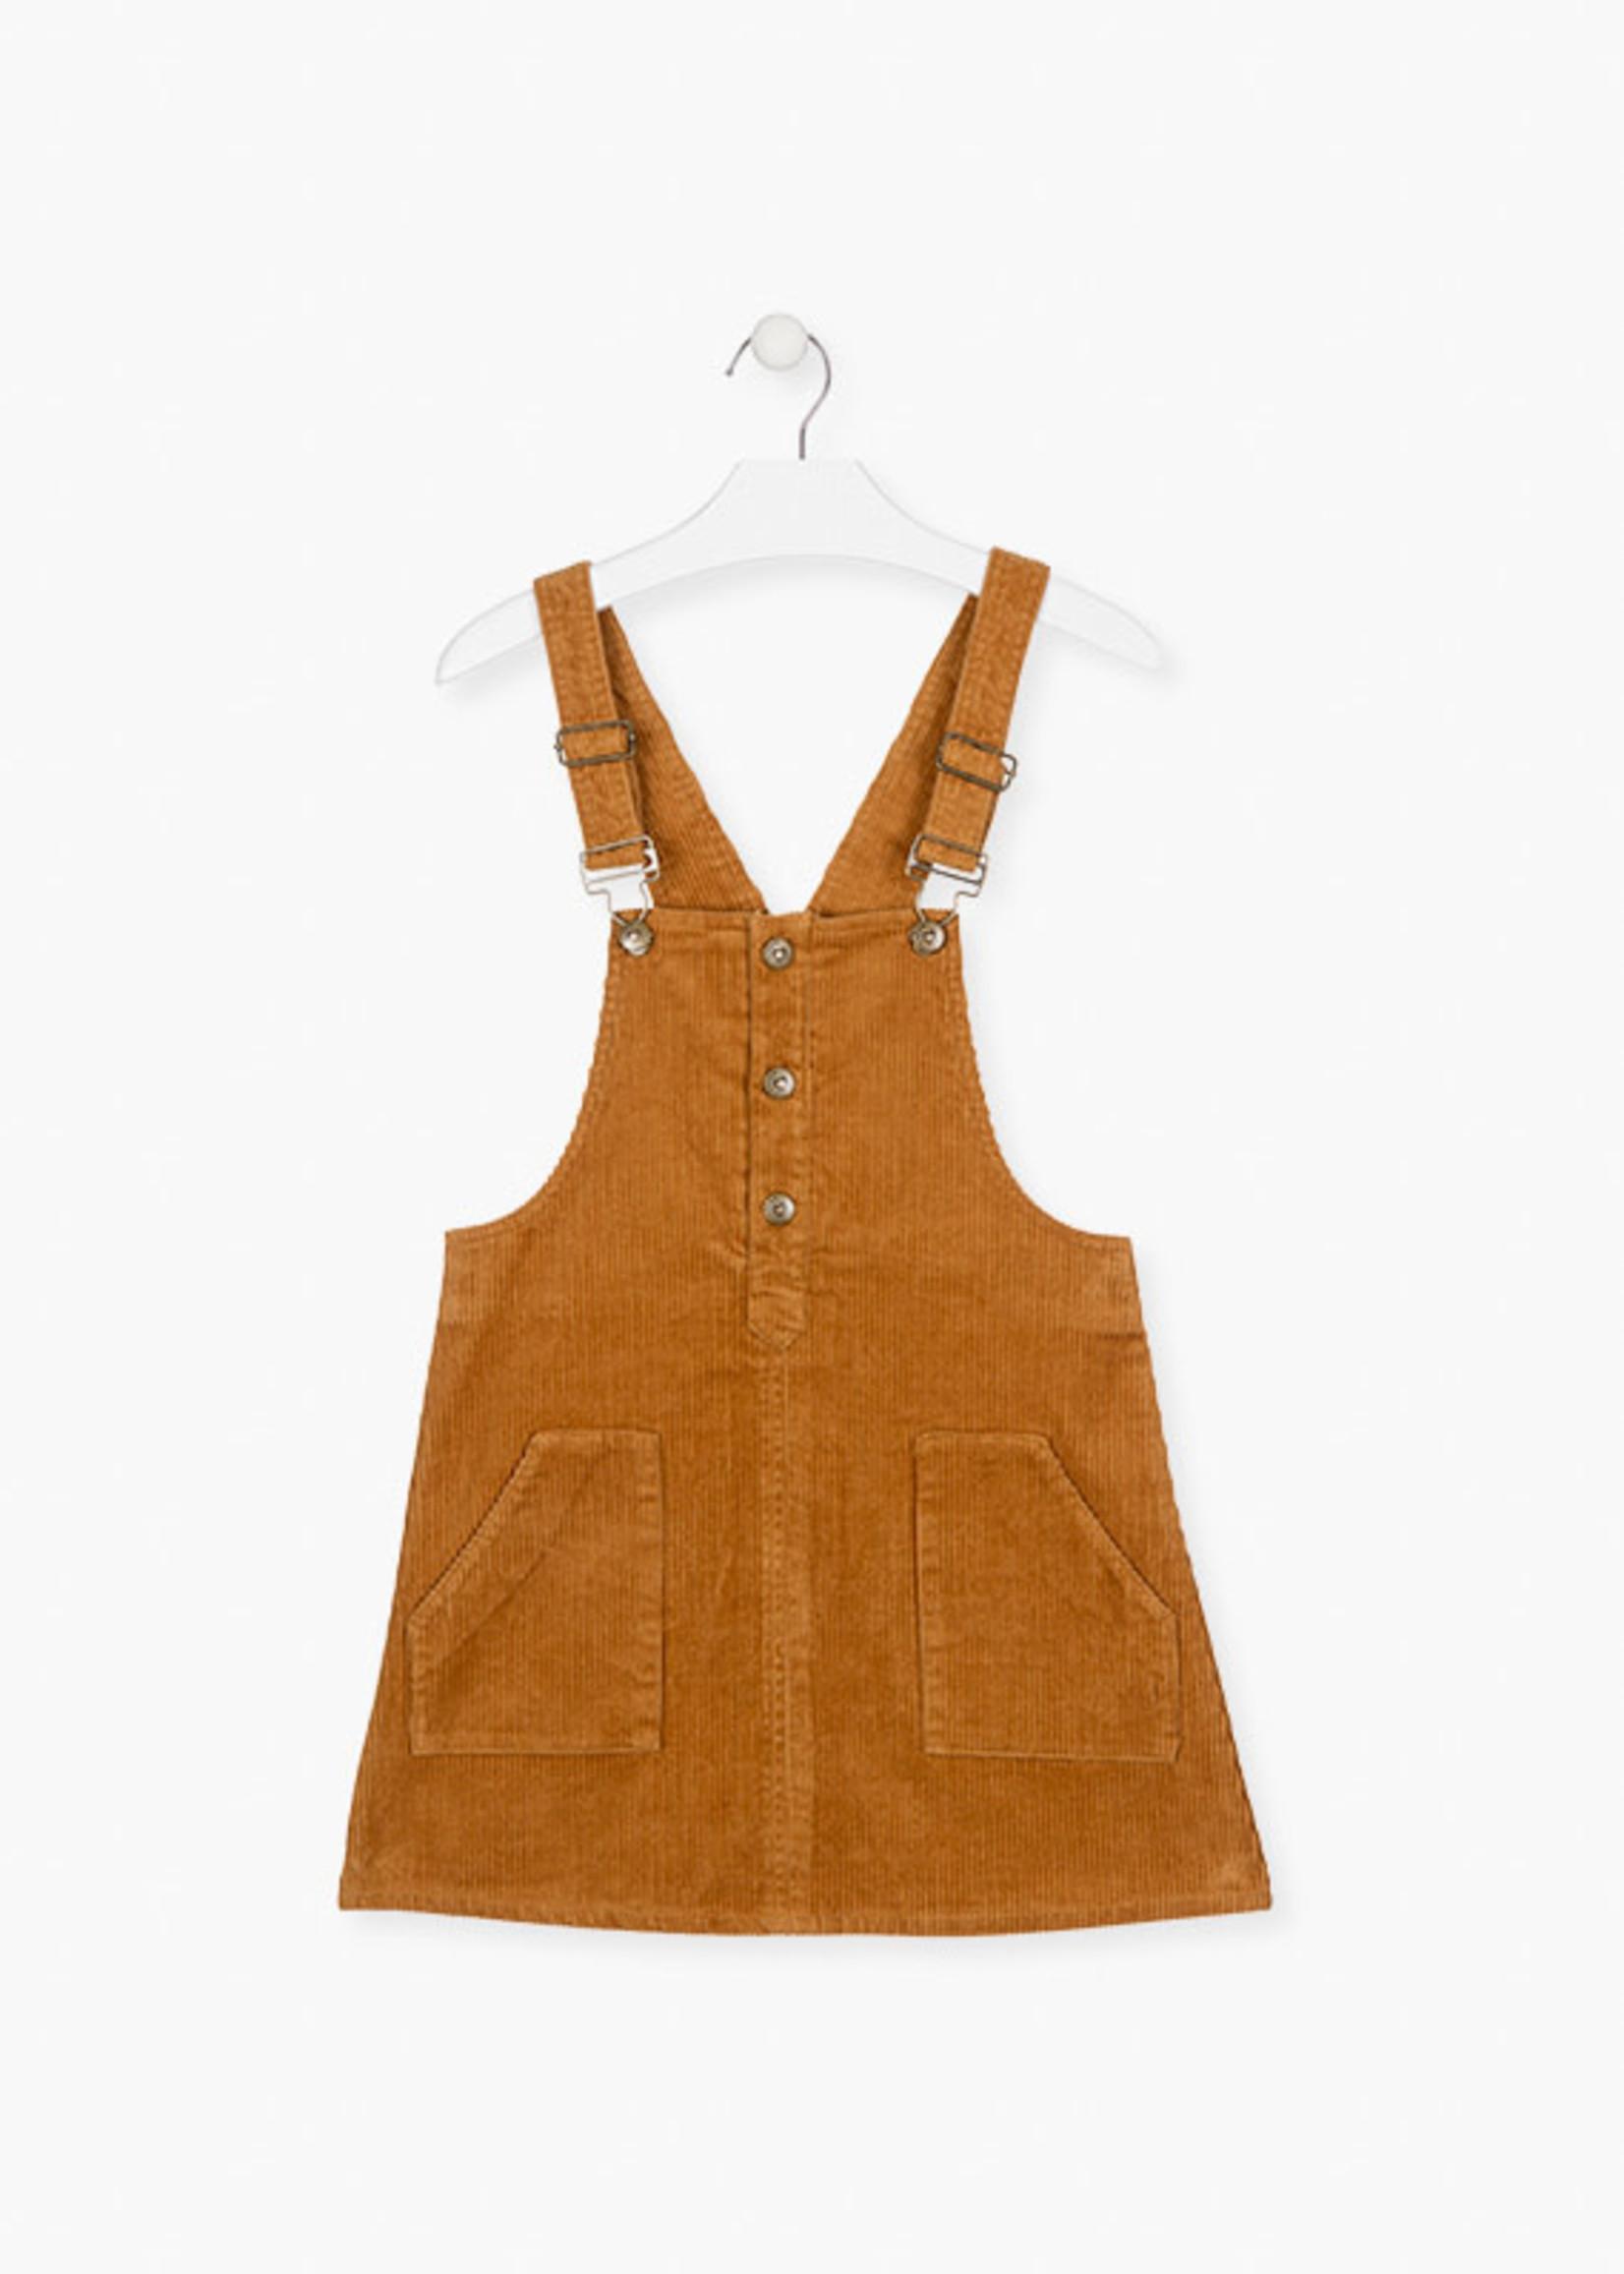 Losan PINAFORE DRESS - Mustard